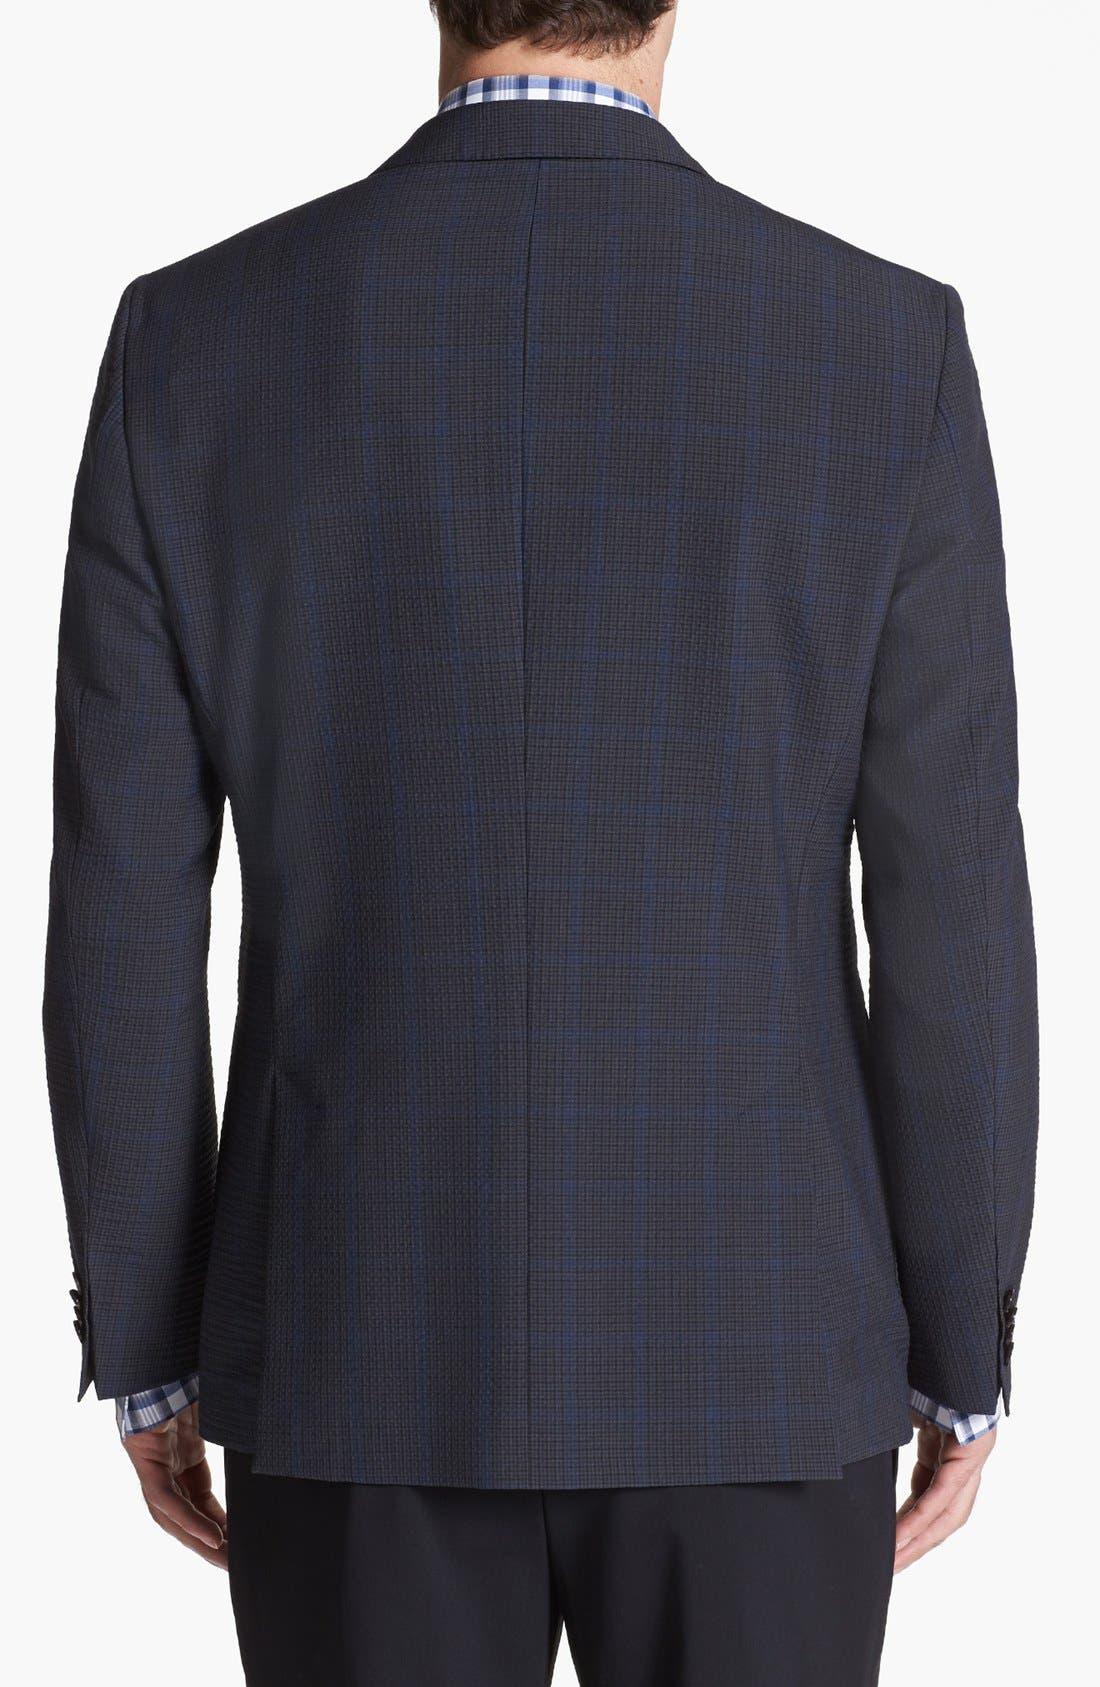 Alternate Image 3  - BOSS HUGO BOSS 'Jesse' Trim Fit Plaid Sportcoat